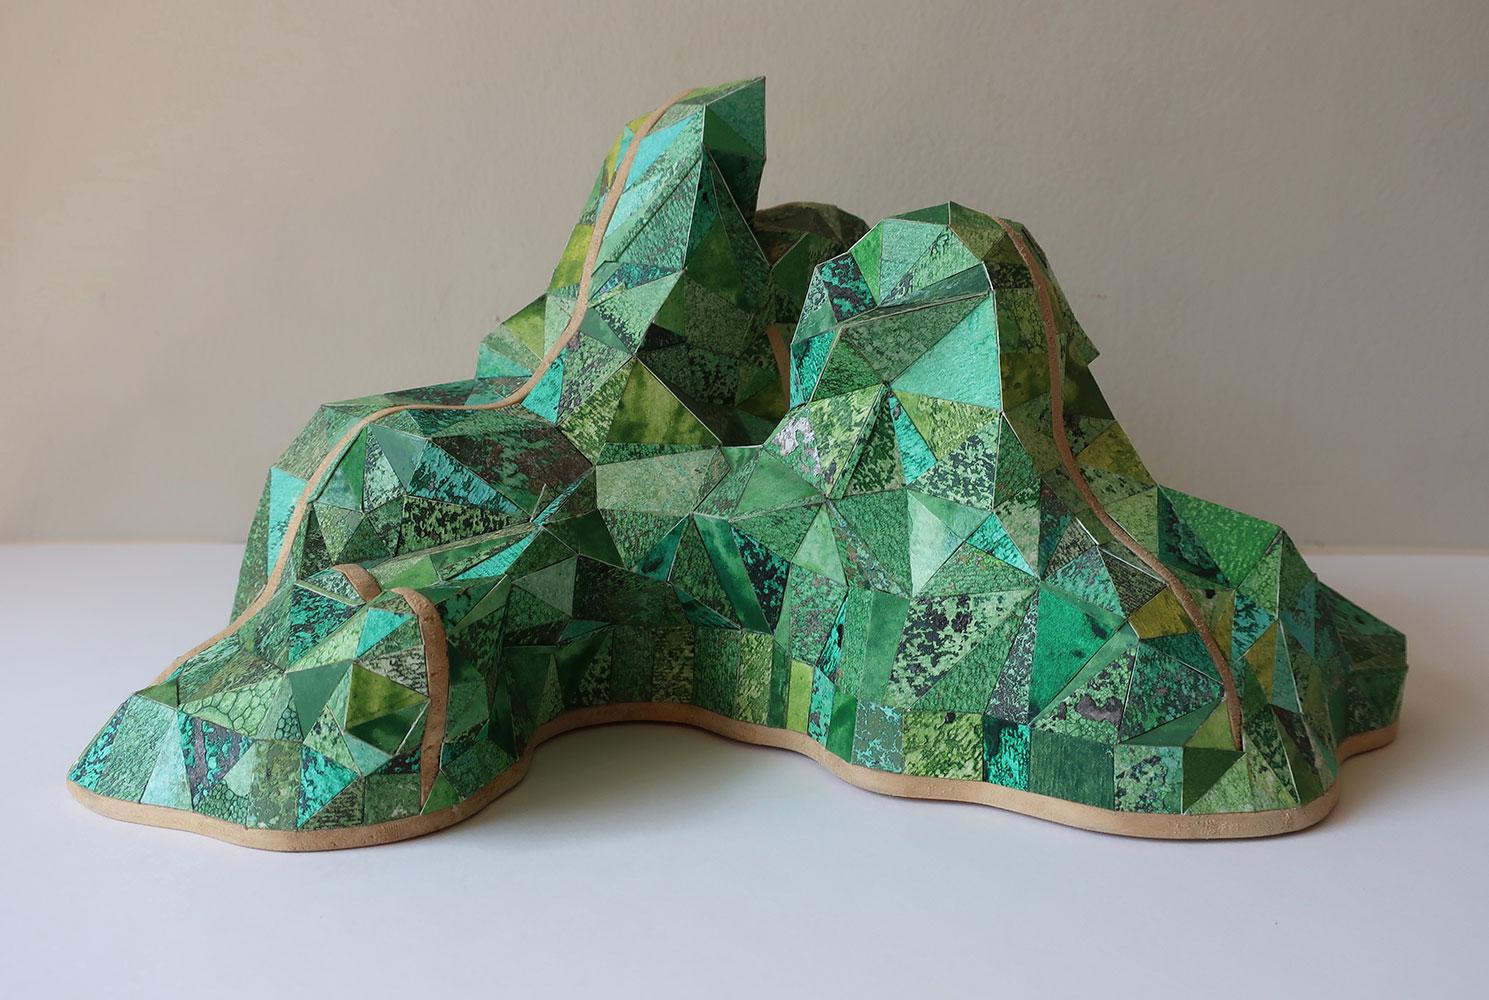 "Sophia Allison, Untitled (Green Mountain), Acrylic and studio floor dirt on watercolor paper, wood, 5 ½"" x 5 ¼"" x 12"""